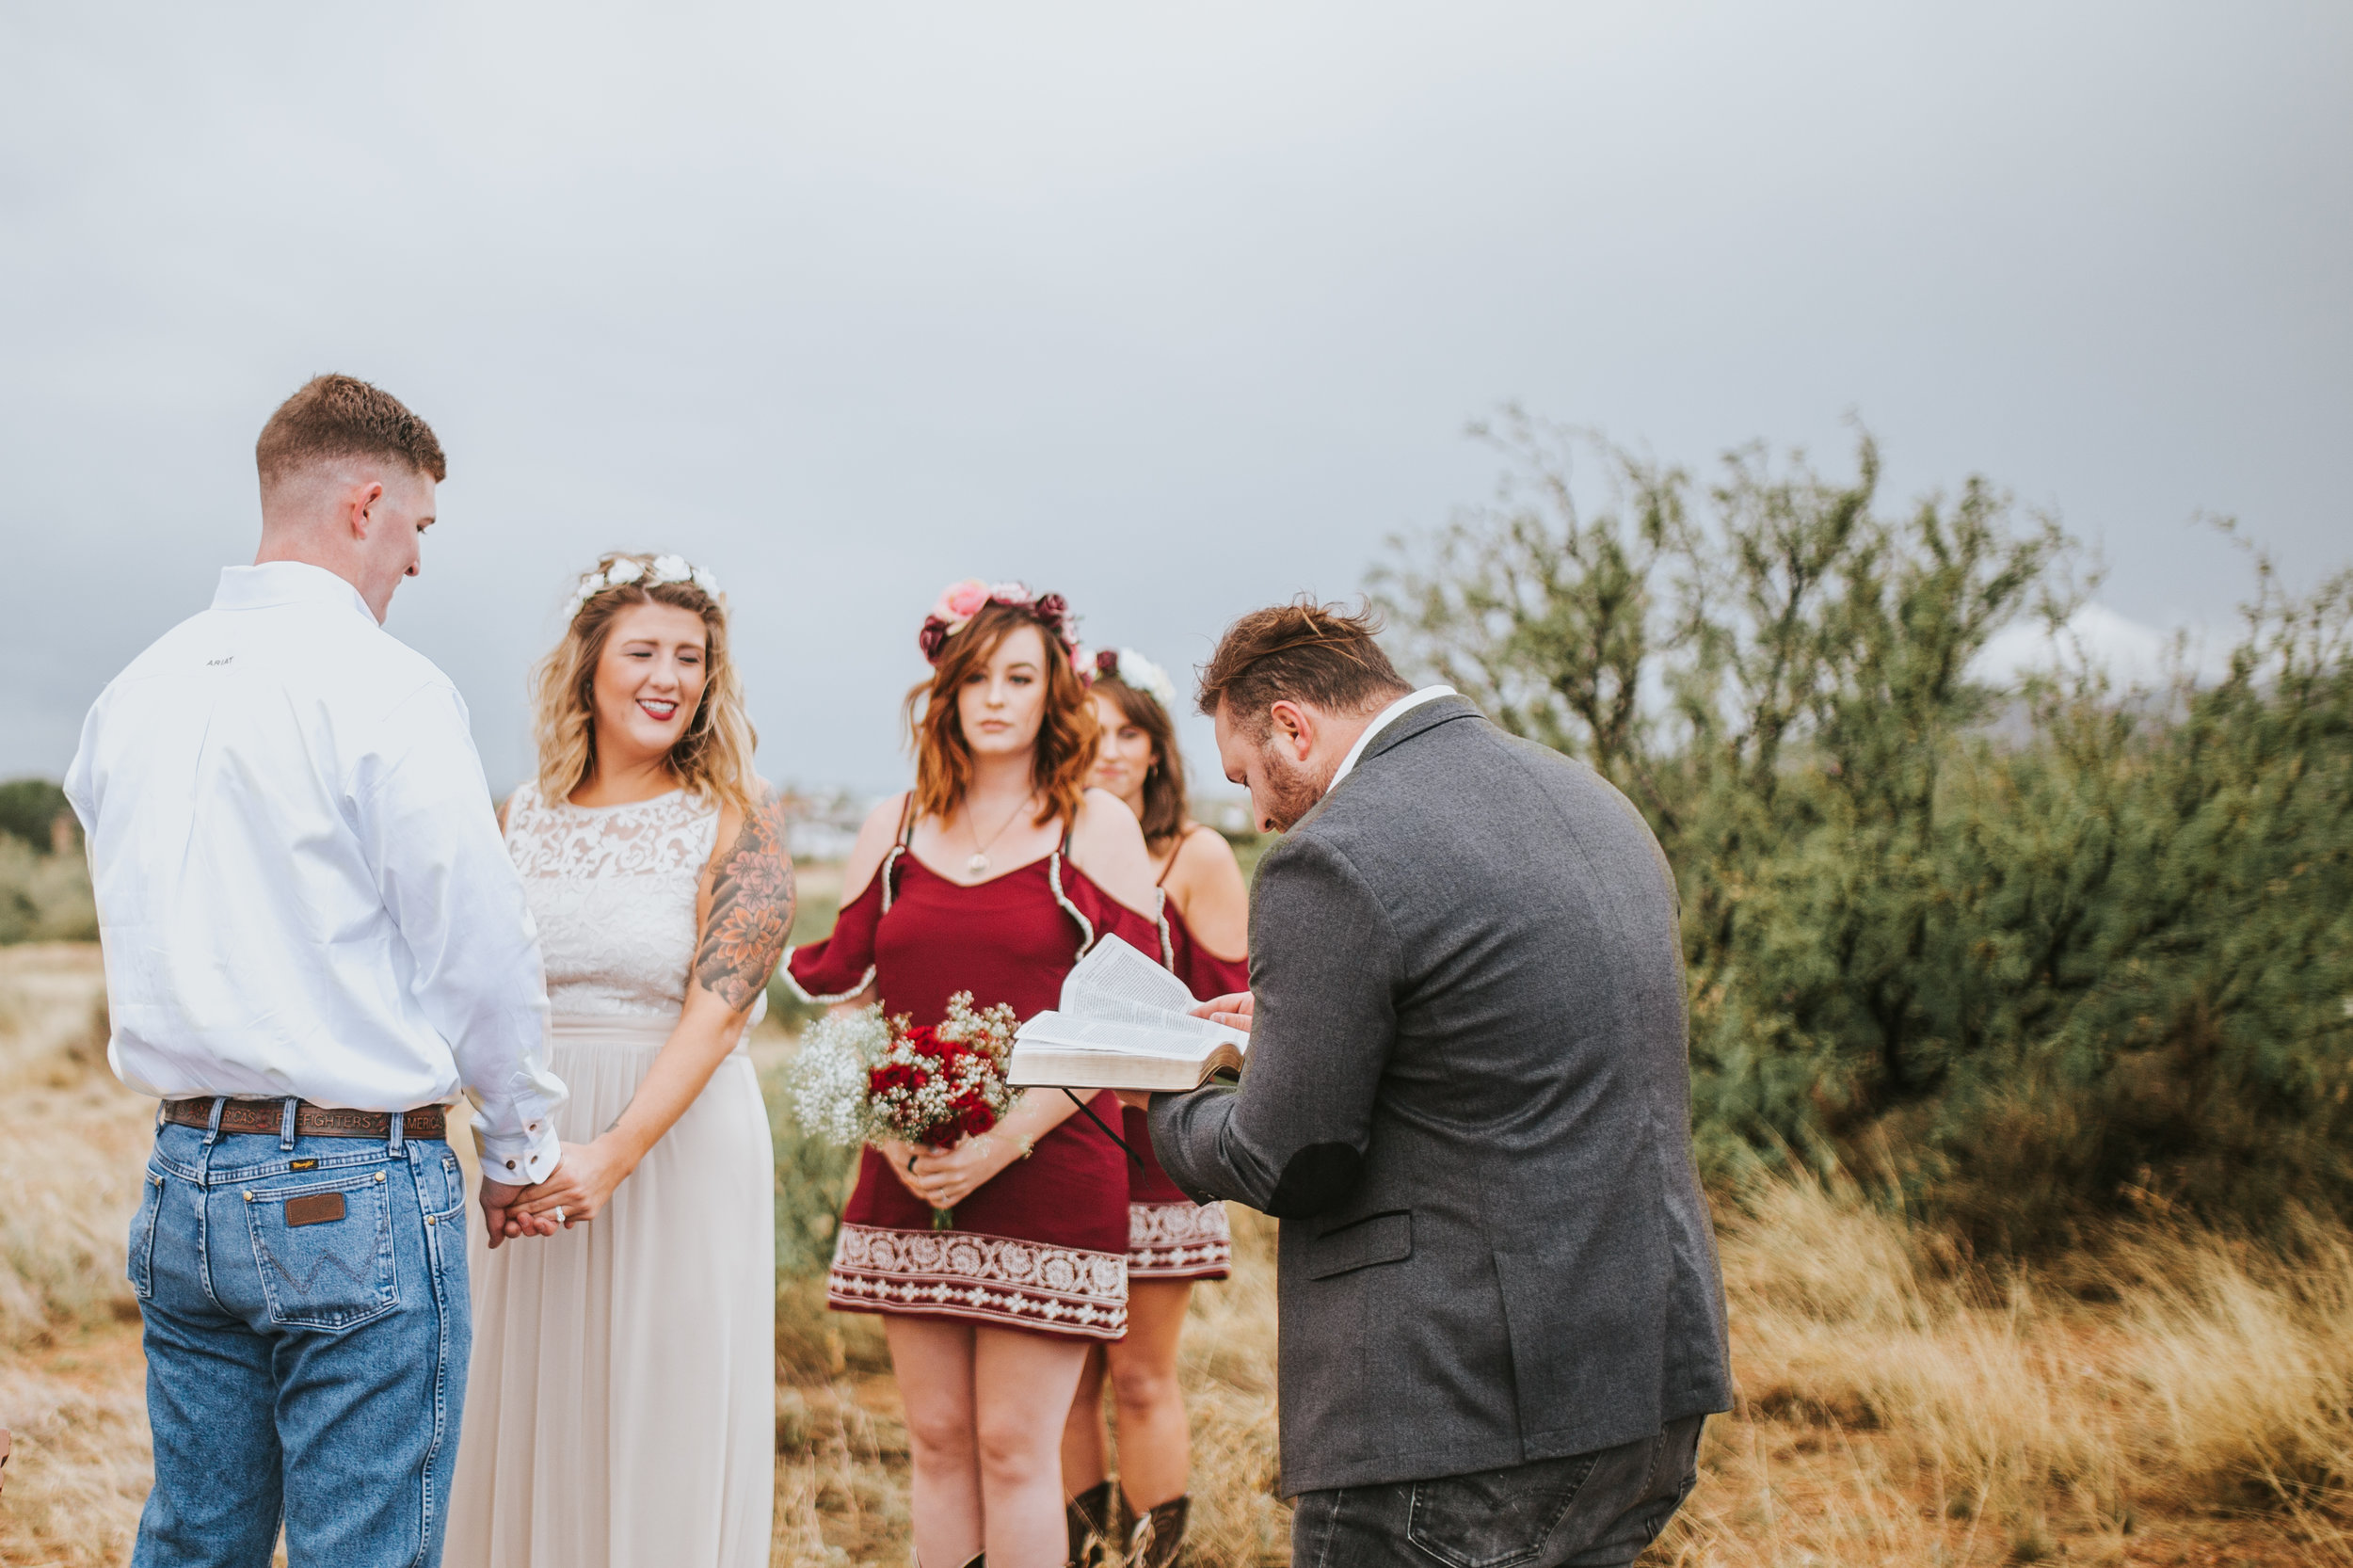 el-paso-texas-wedding-photographer-10